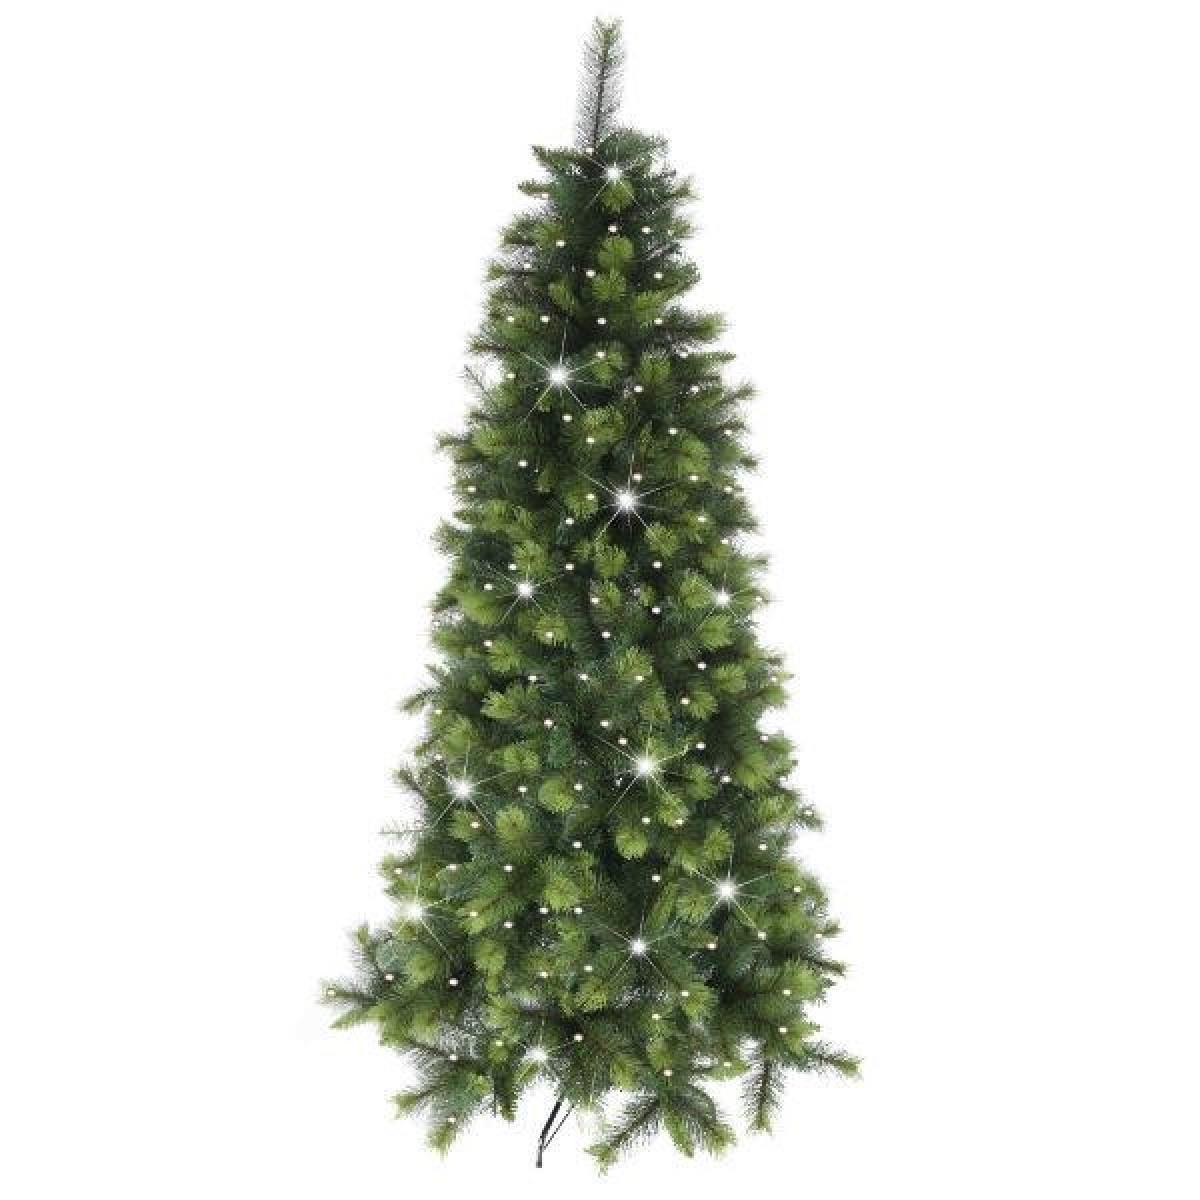 7ft Christmas Tree.Lets Sparkle Pre Lit Inishowen Pine 7ft Christmas Tree